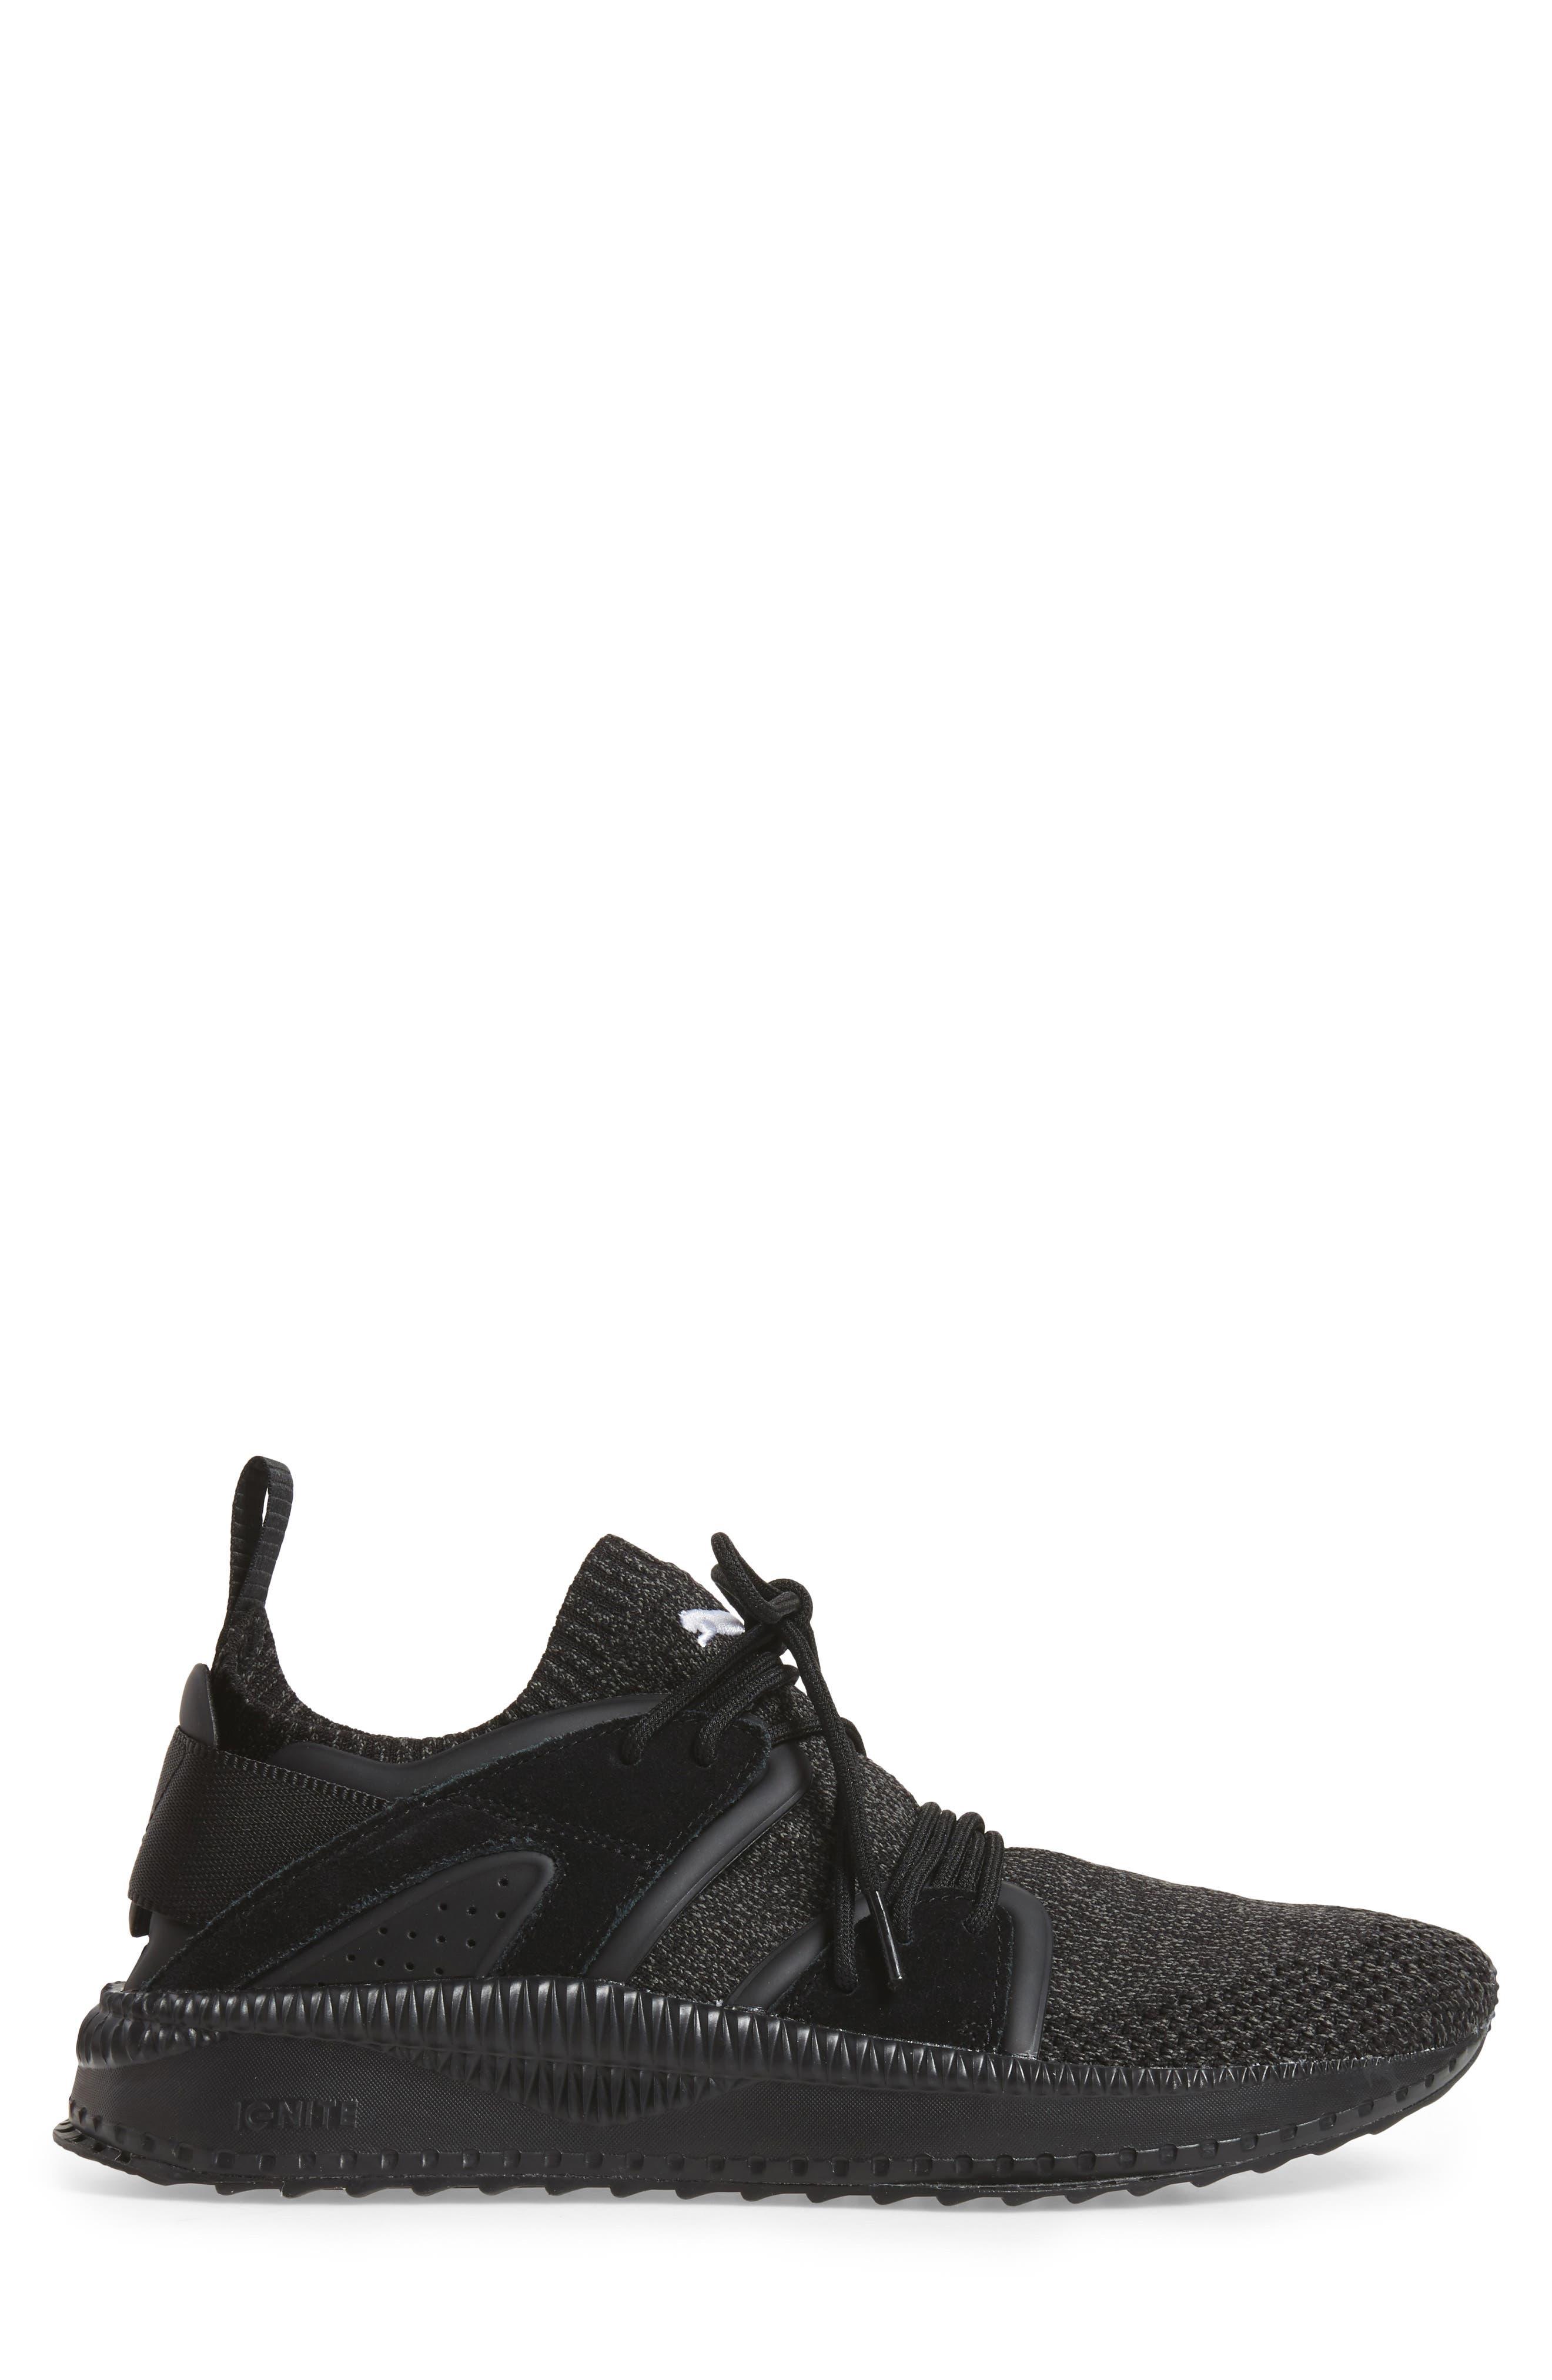 Tsugi Blaze EvoKnit Sneaker,                             Alternate thumbnail 3, color,                             001